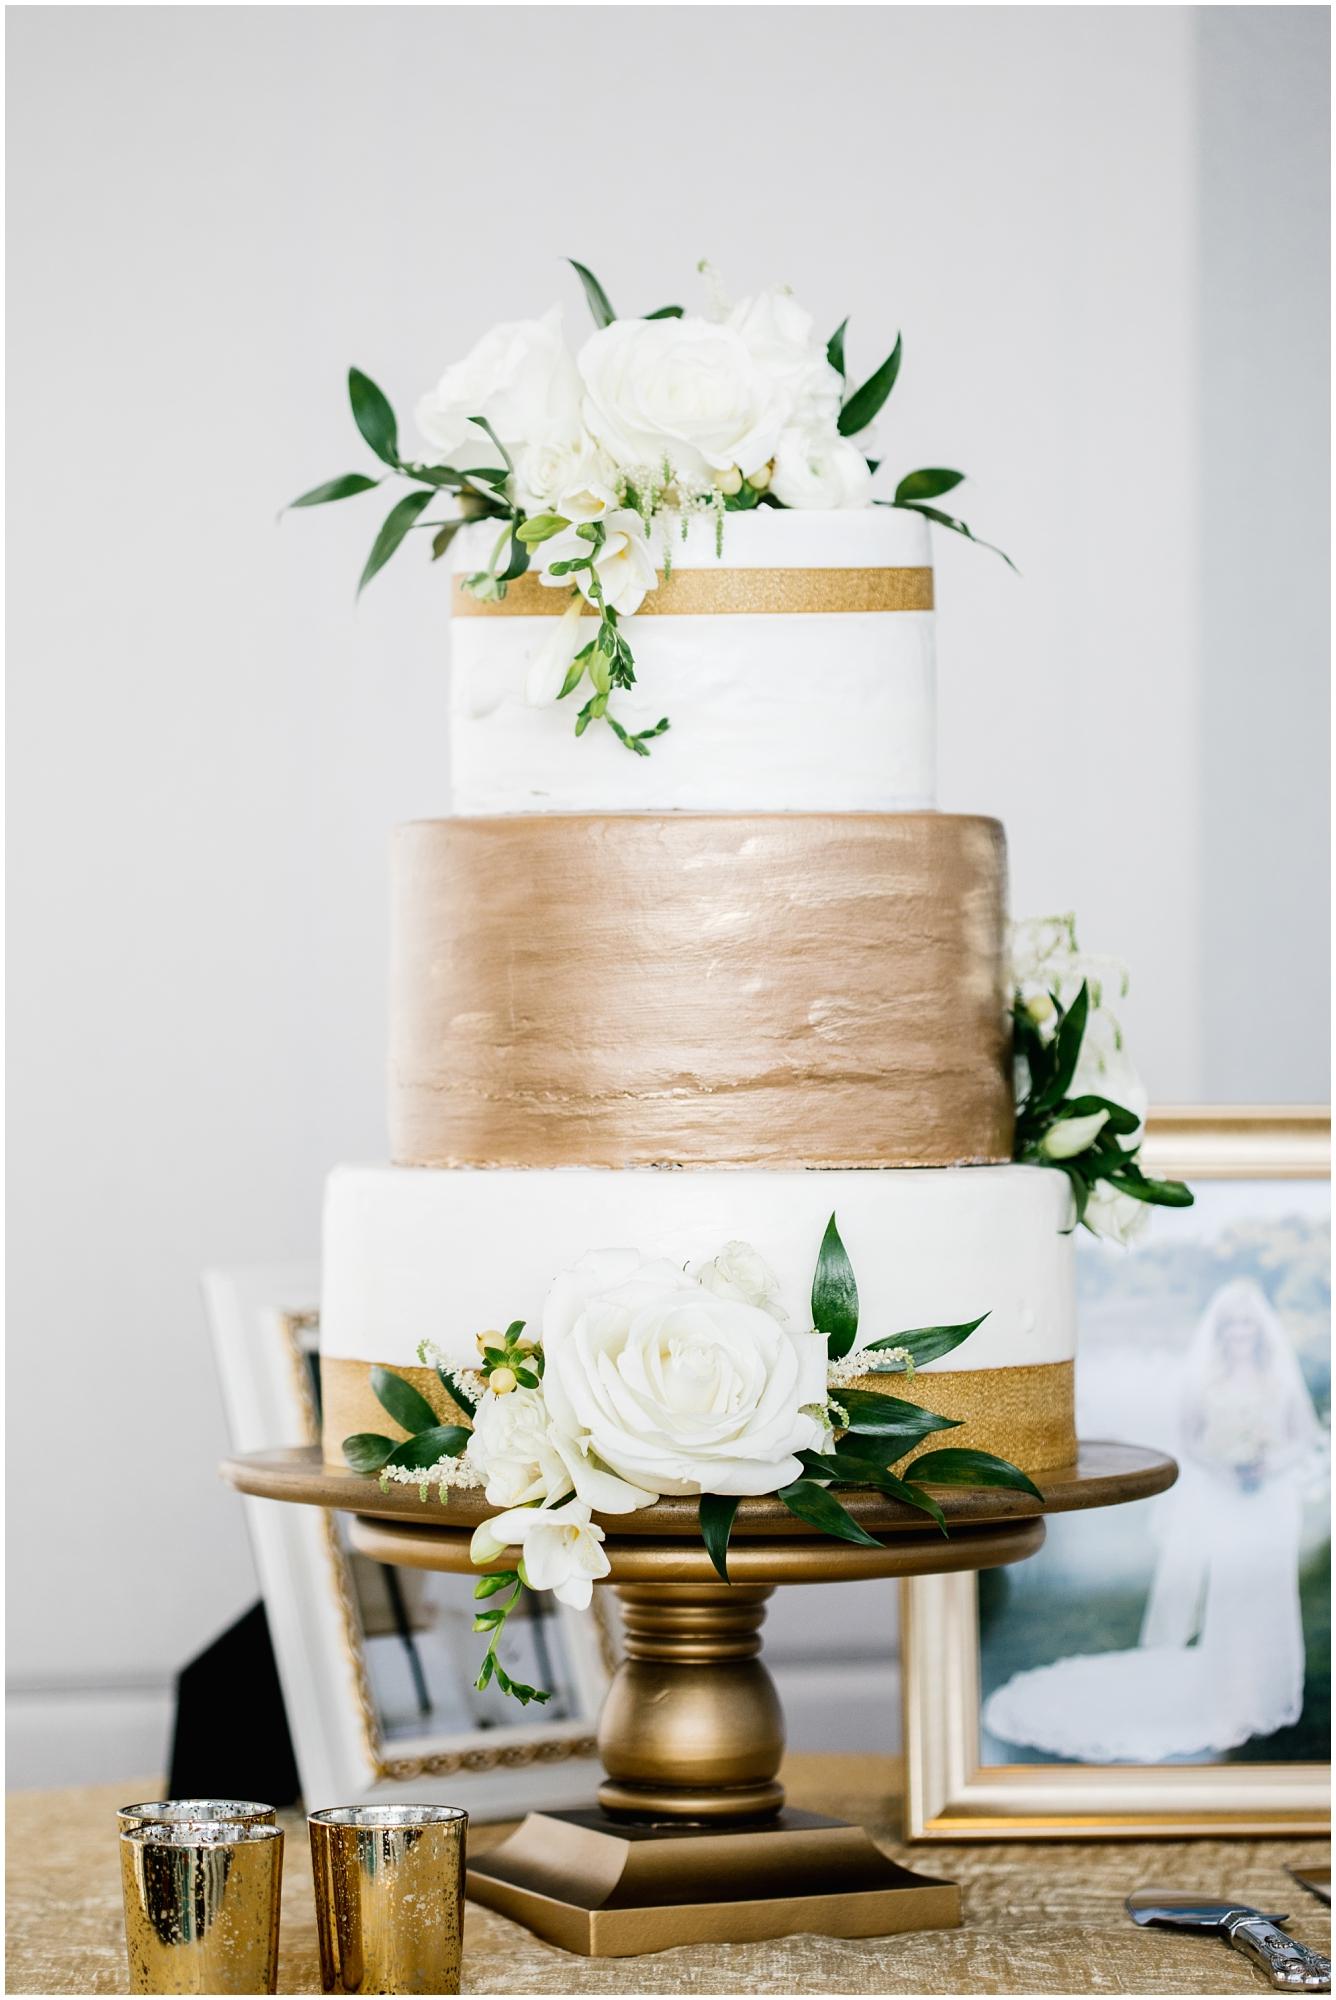 CherylandTyler-466_Lizzie-B-Imagery-Utah-Wedding-Photographer-Park-City-Salt-Lake-City-Temple-Wells-Fargo-Building.jpg